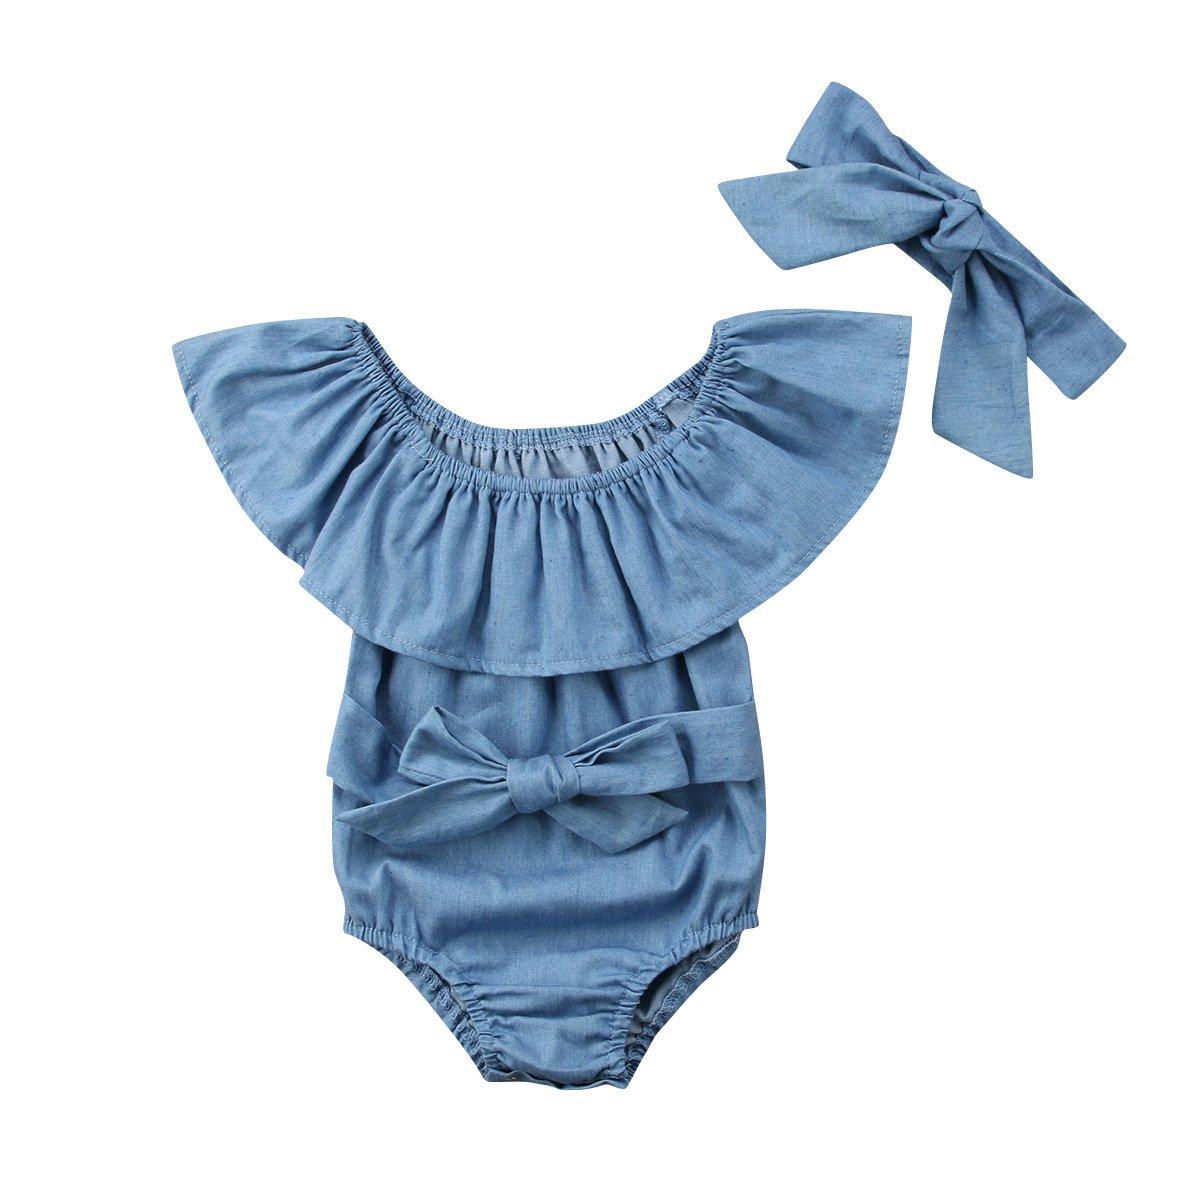 Baby Girl Infant Denim Ruffle Romper Bodysuit Jumpsuit Outfit Kid Clothes Summer